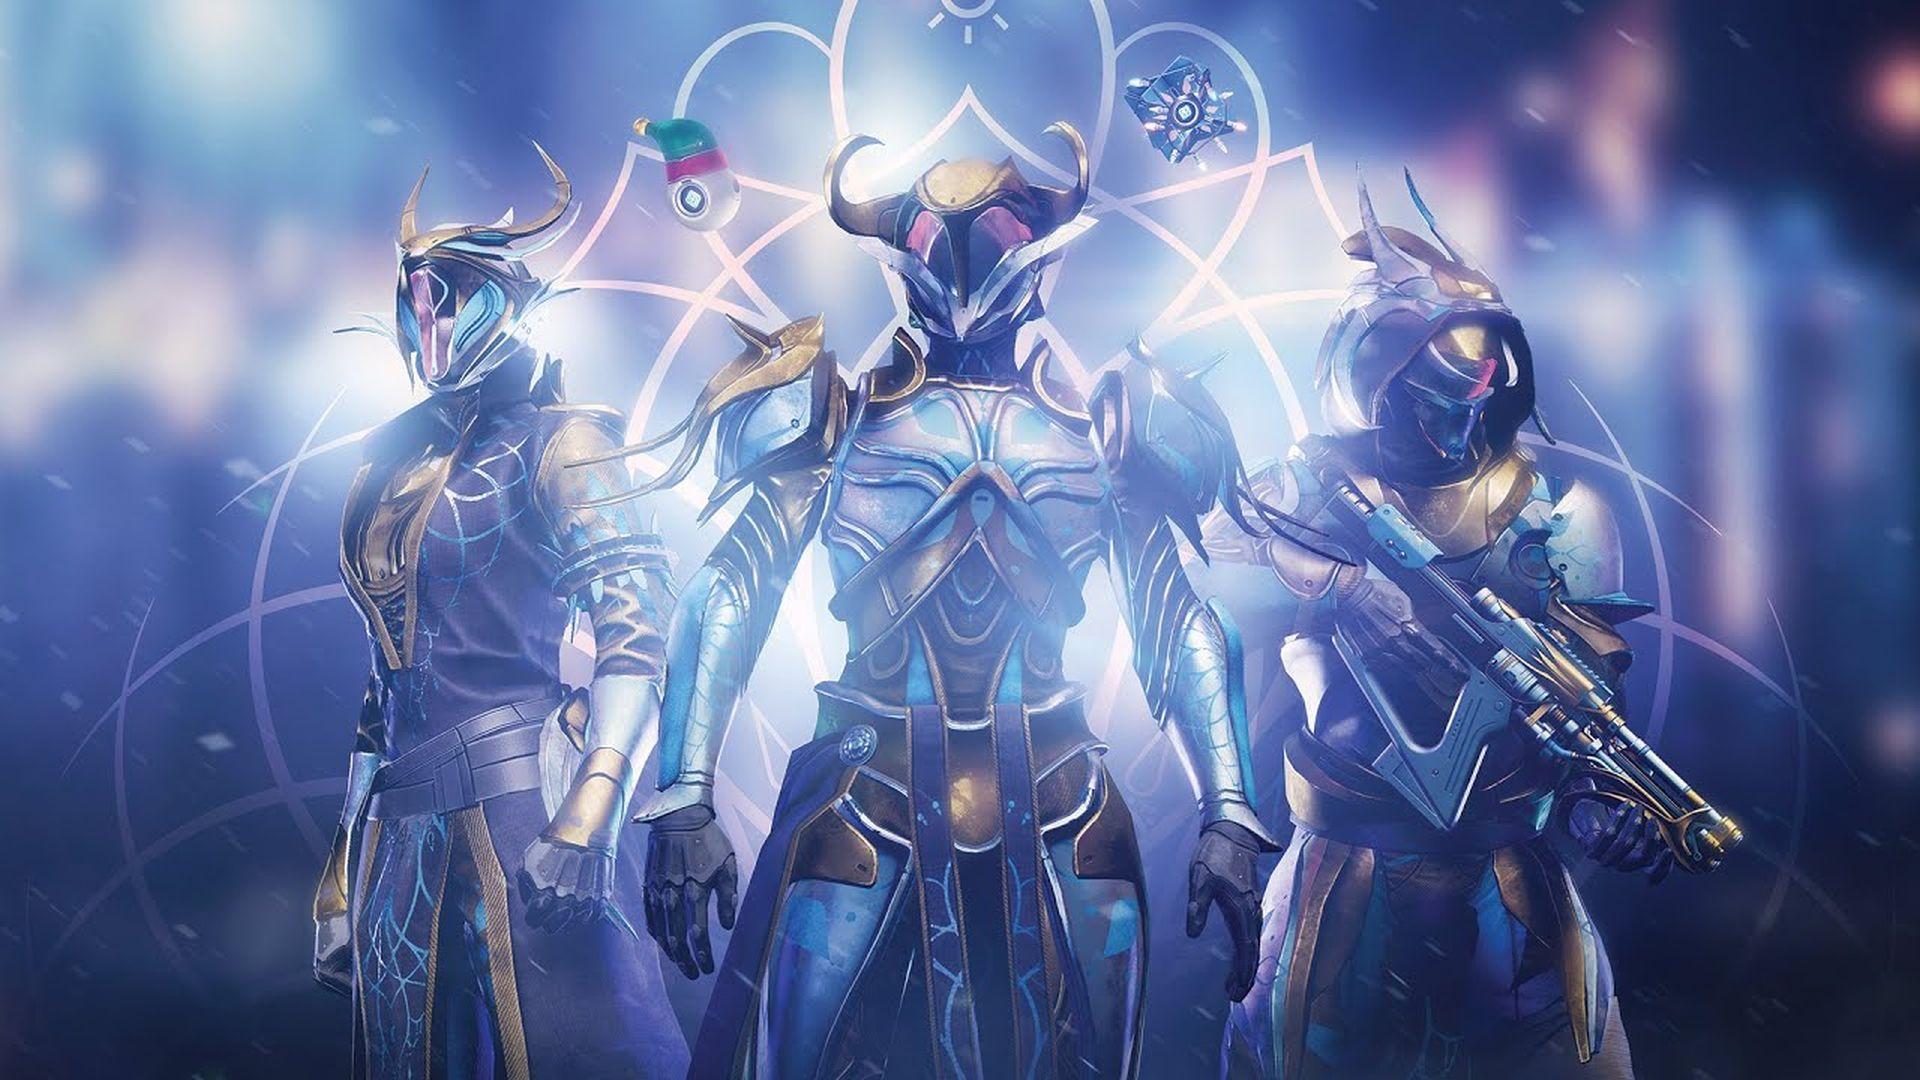 Destiny 2 Beyond Light - The Dawning